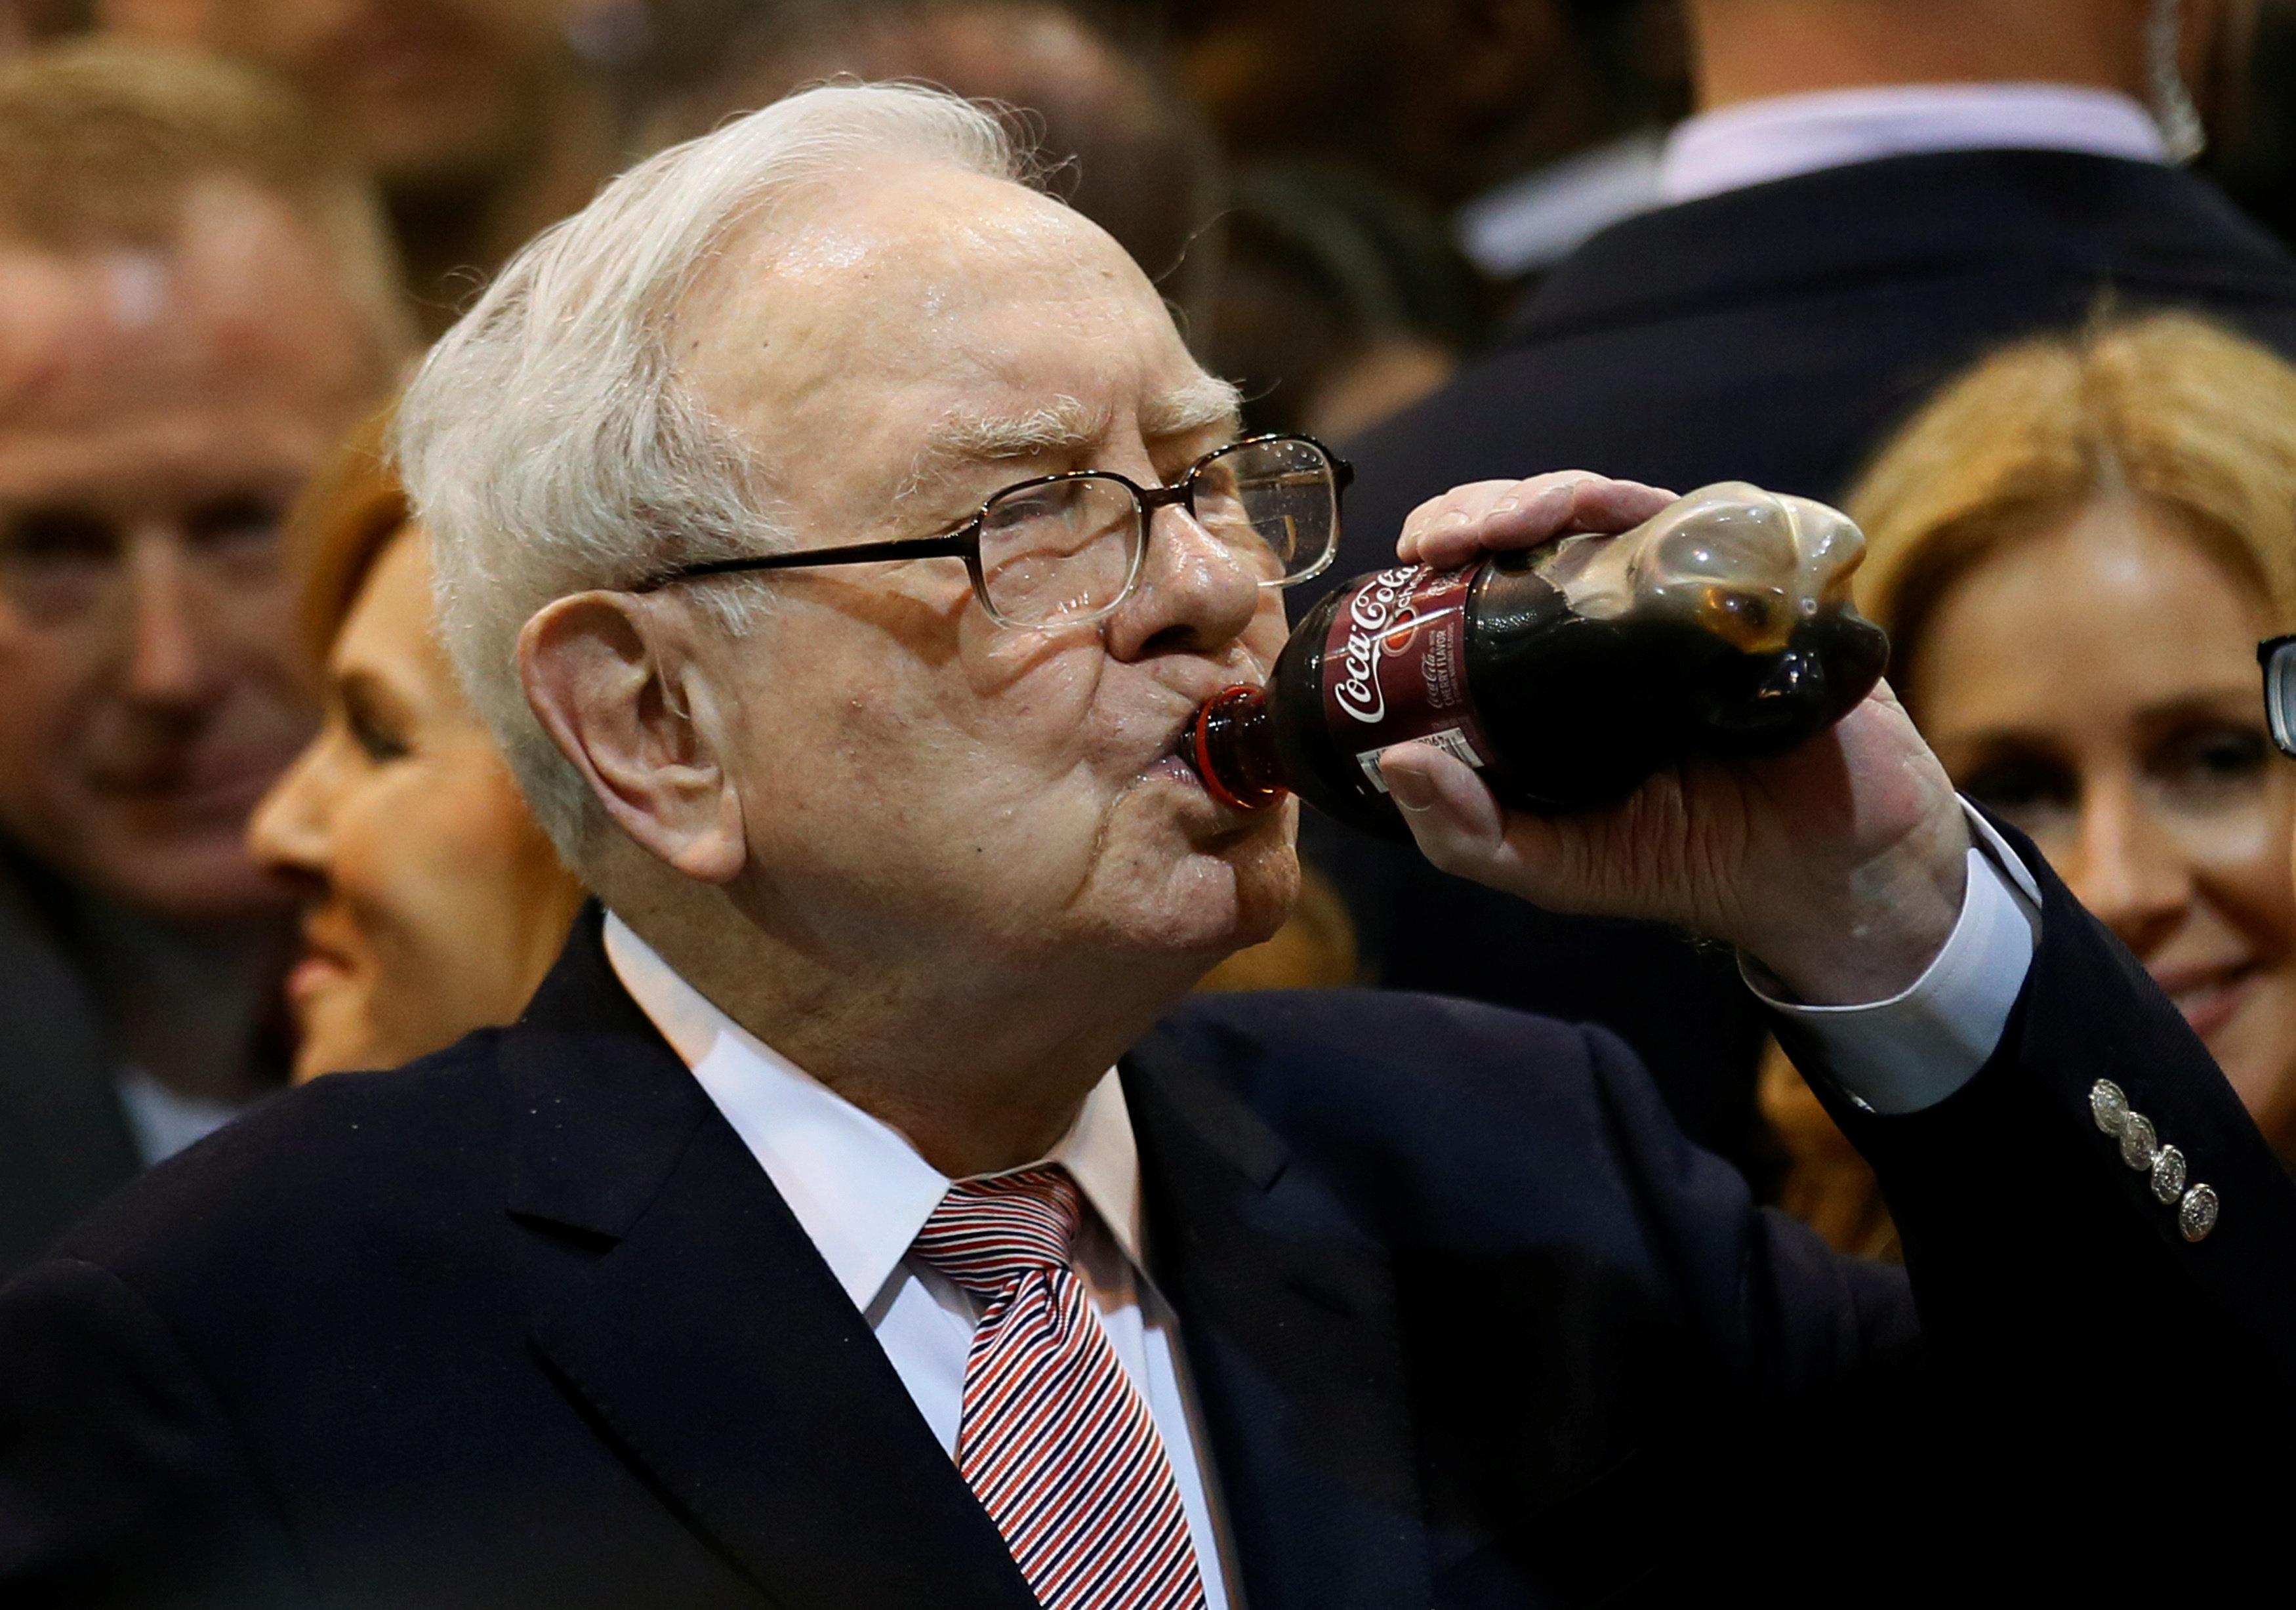 Berkshire Hathaway chairman and CEO Warren Buffett enjoys his favourite beverage, cherry Coke, before the Berkshire Hathaway annual meeting in Omaha, Nebraska, U.S. May 6, 2017. REUTERS/Rick Wilking